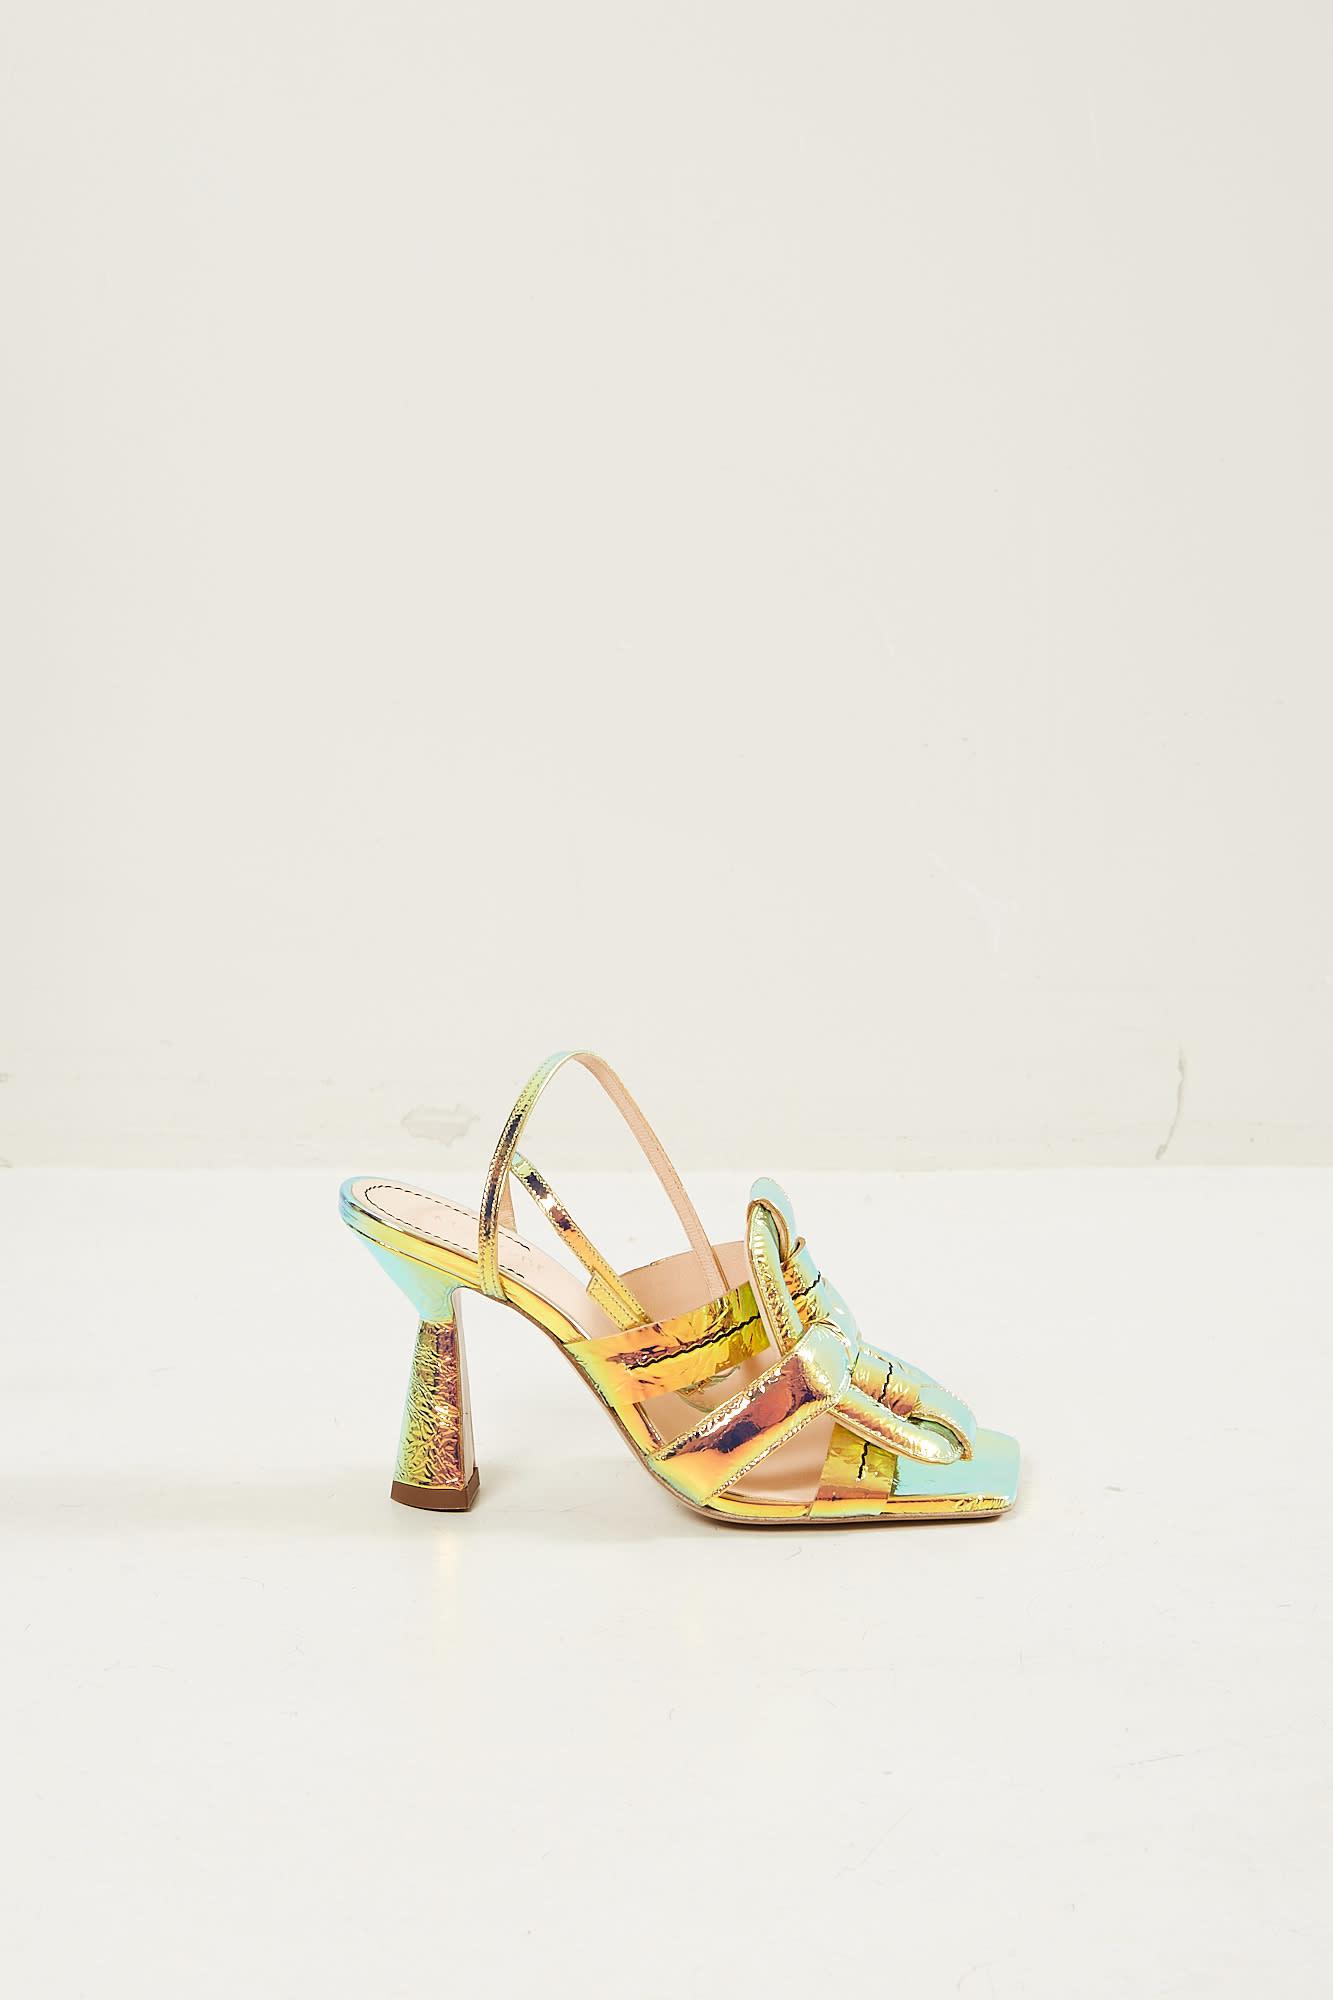 Morobé - Celestine laminated leather sandals